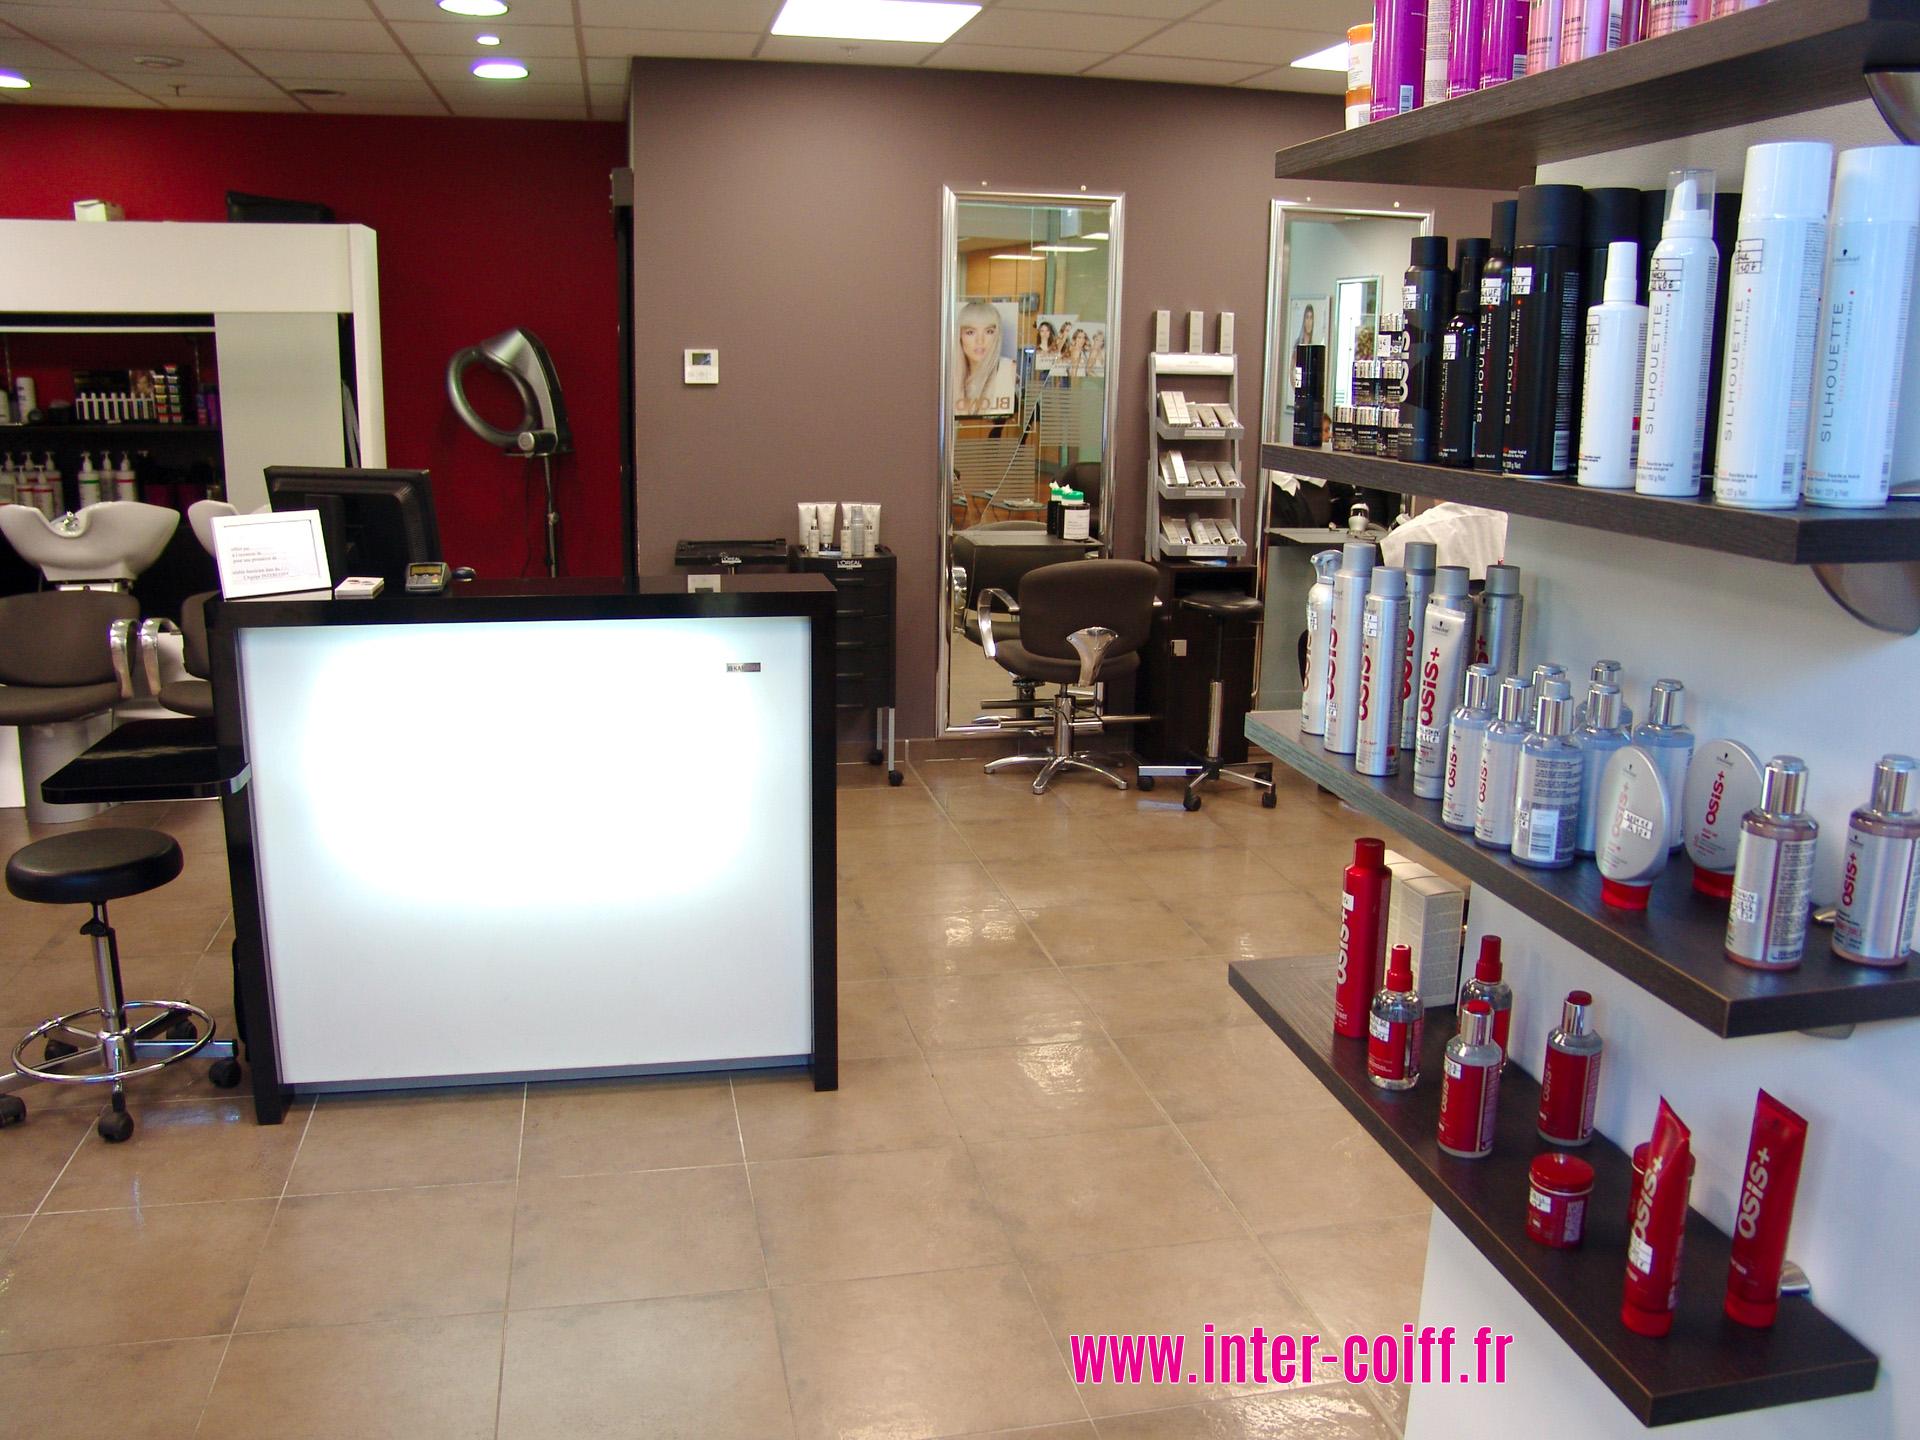 Inter coiff salon sens accueil inter 39 coiff - Salon de coiffure sens ...